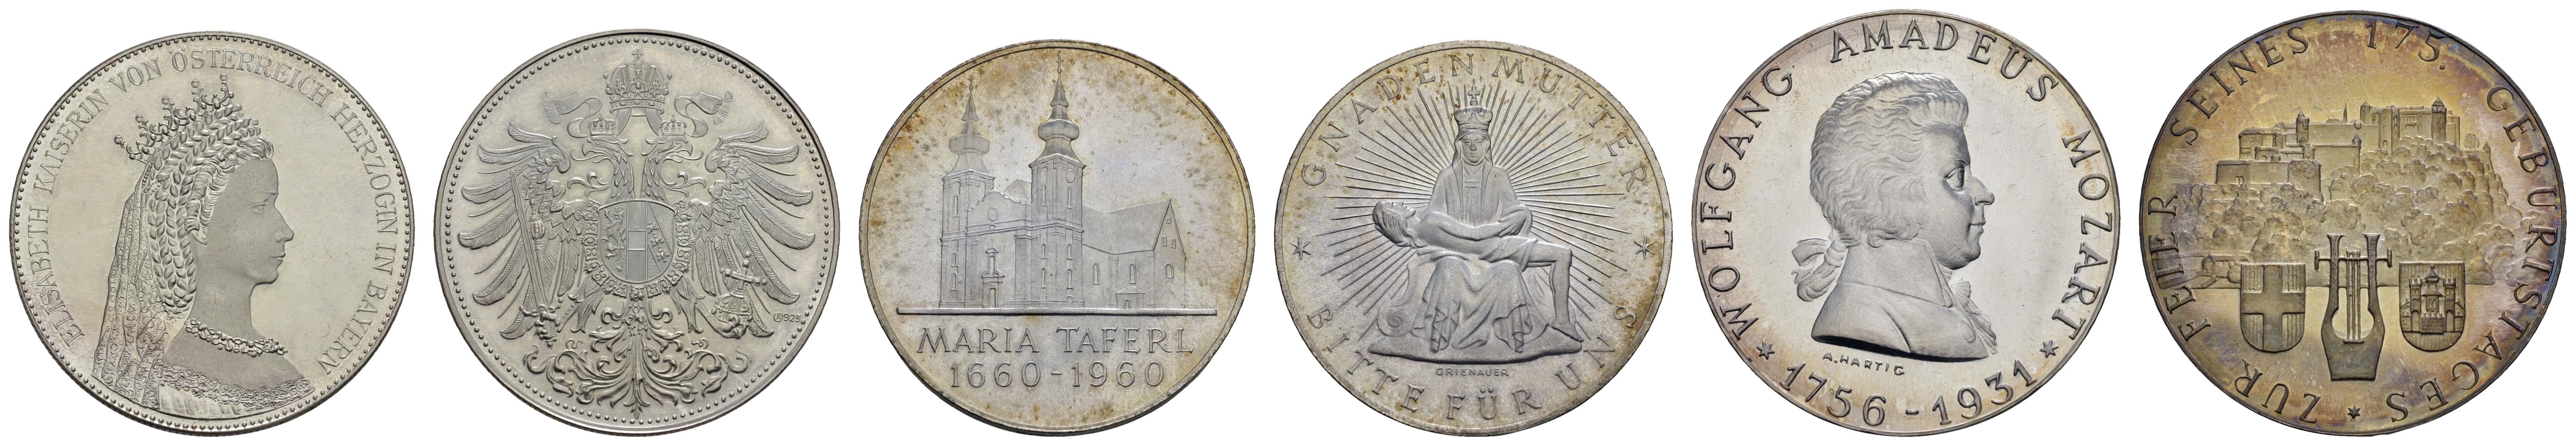 Lot 2272 - medaillen Sonstige Medaillen - Europa -  Auktionshaus Ulrich Felzmann GmbH & Co. KG Coins single lots